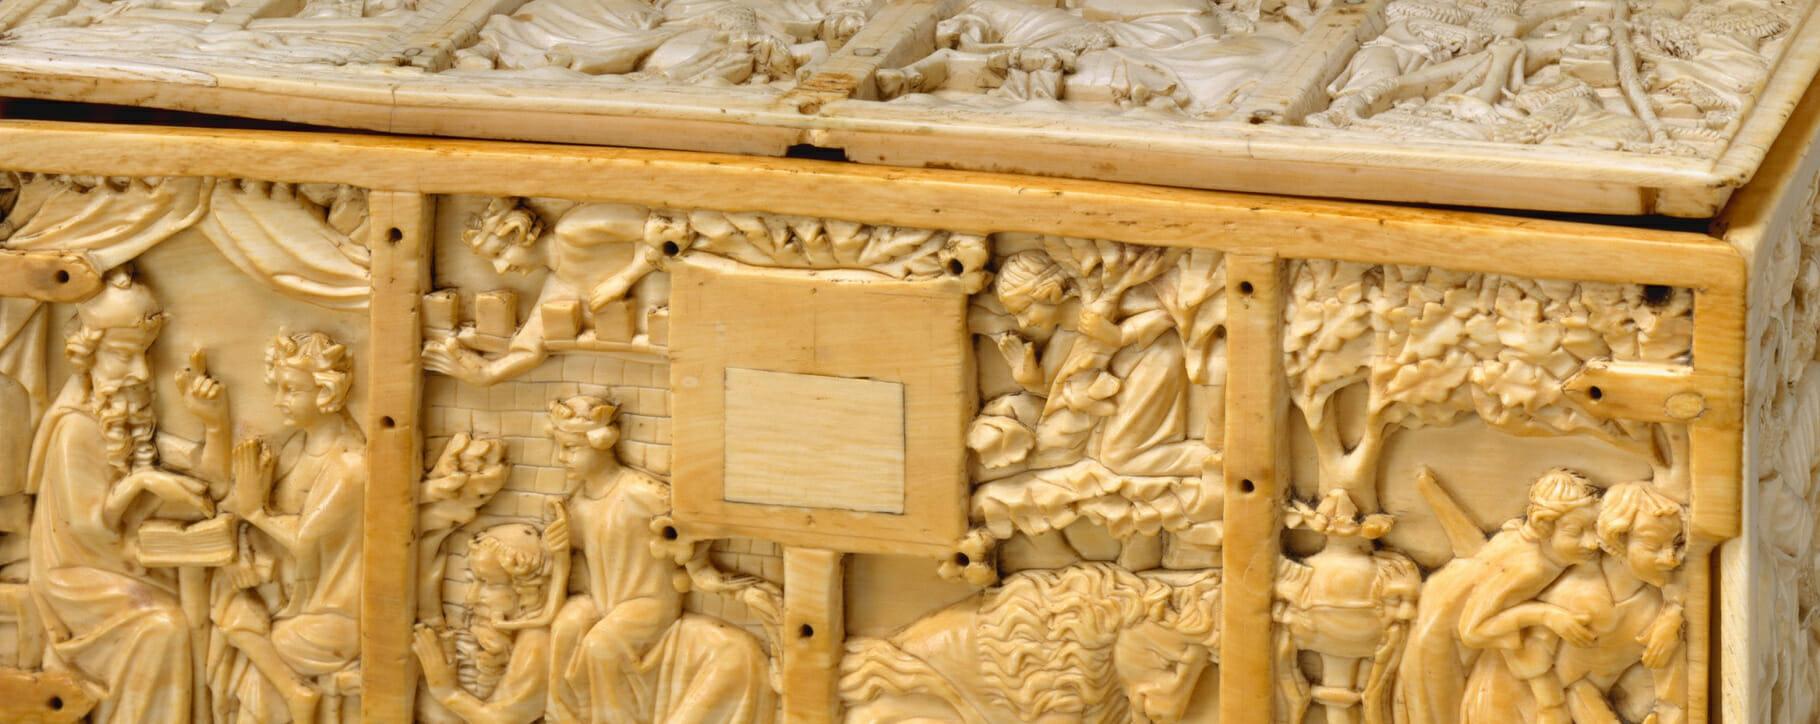 Ivory Casket Box